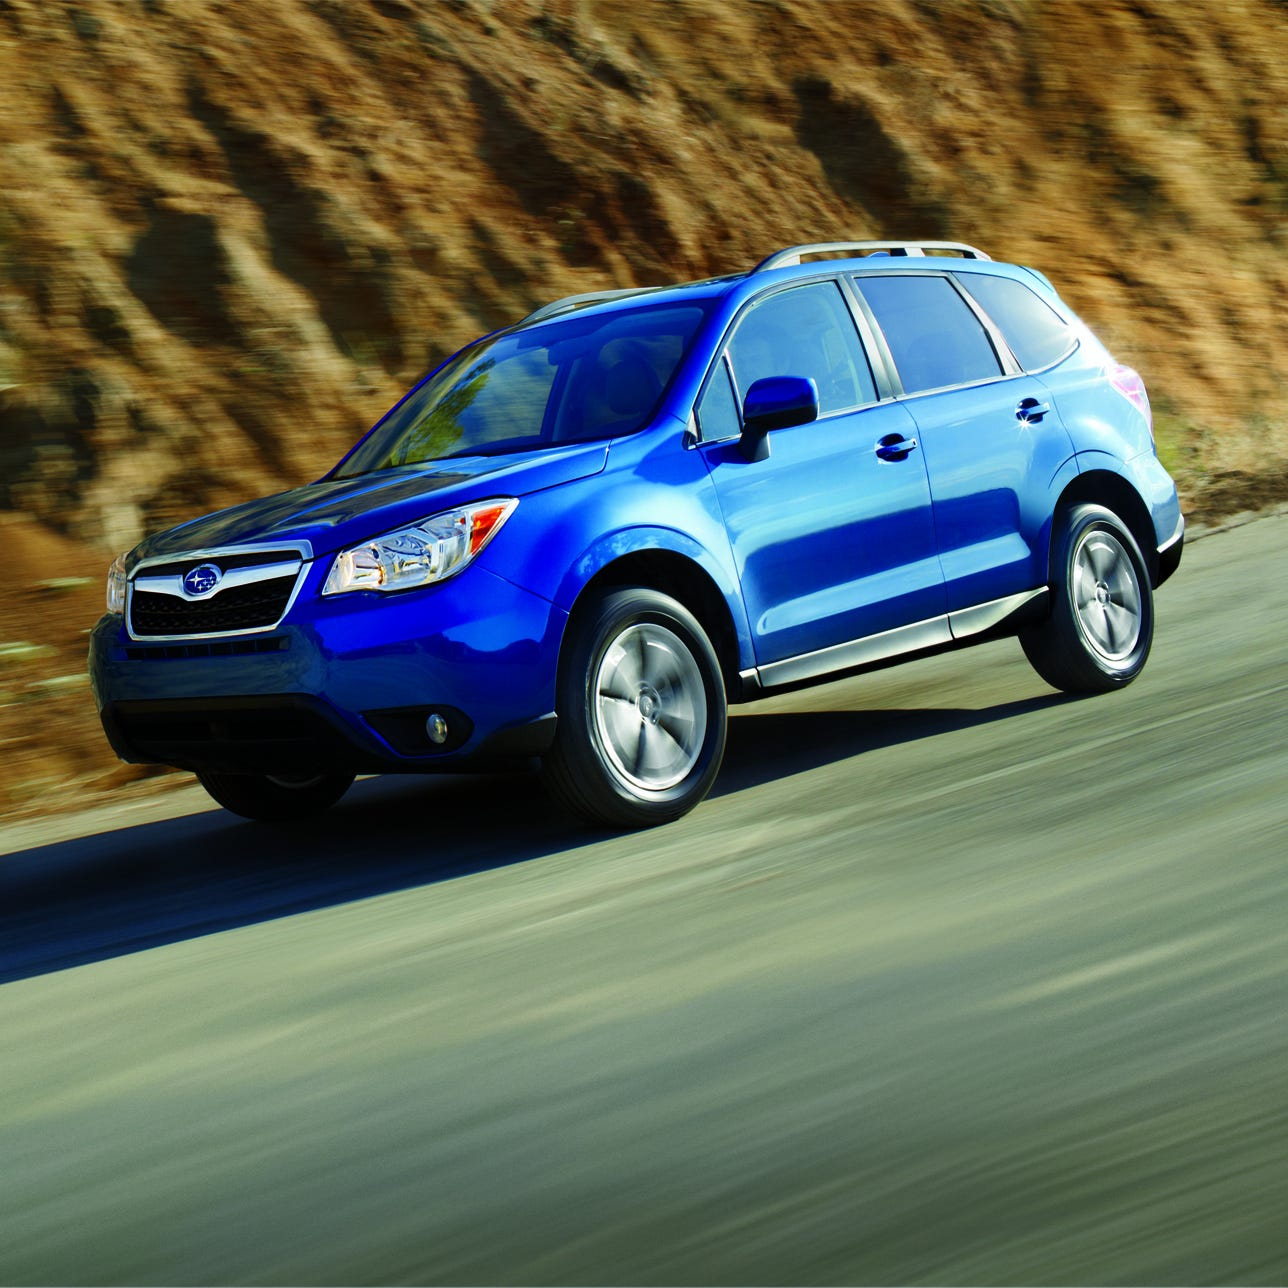 Subaru recalls 1.3M vehicles in US for brake light problem